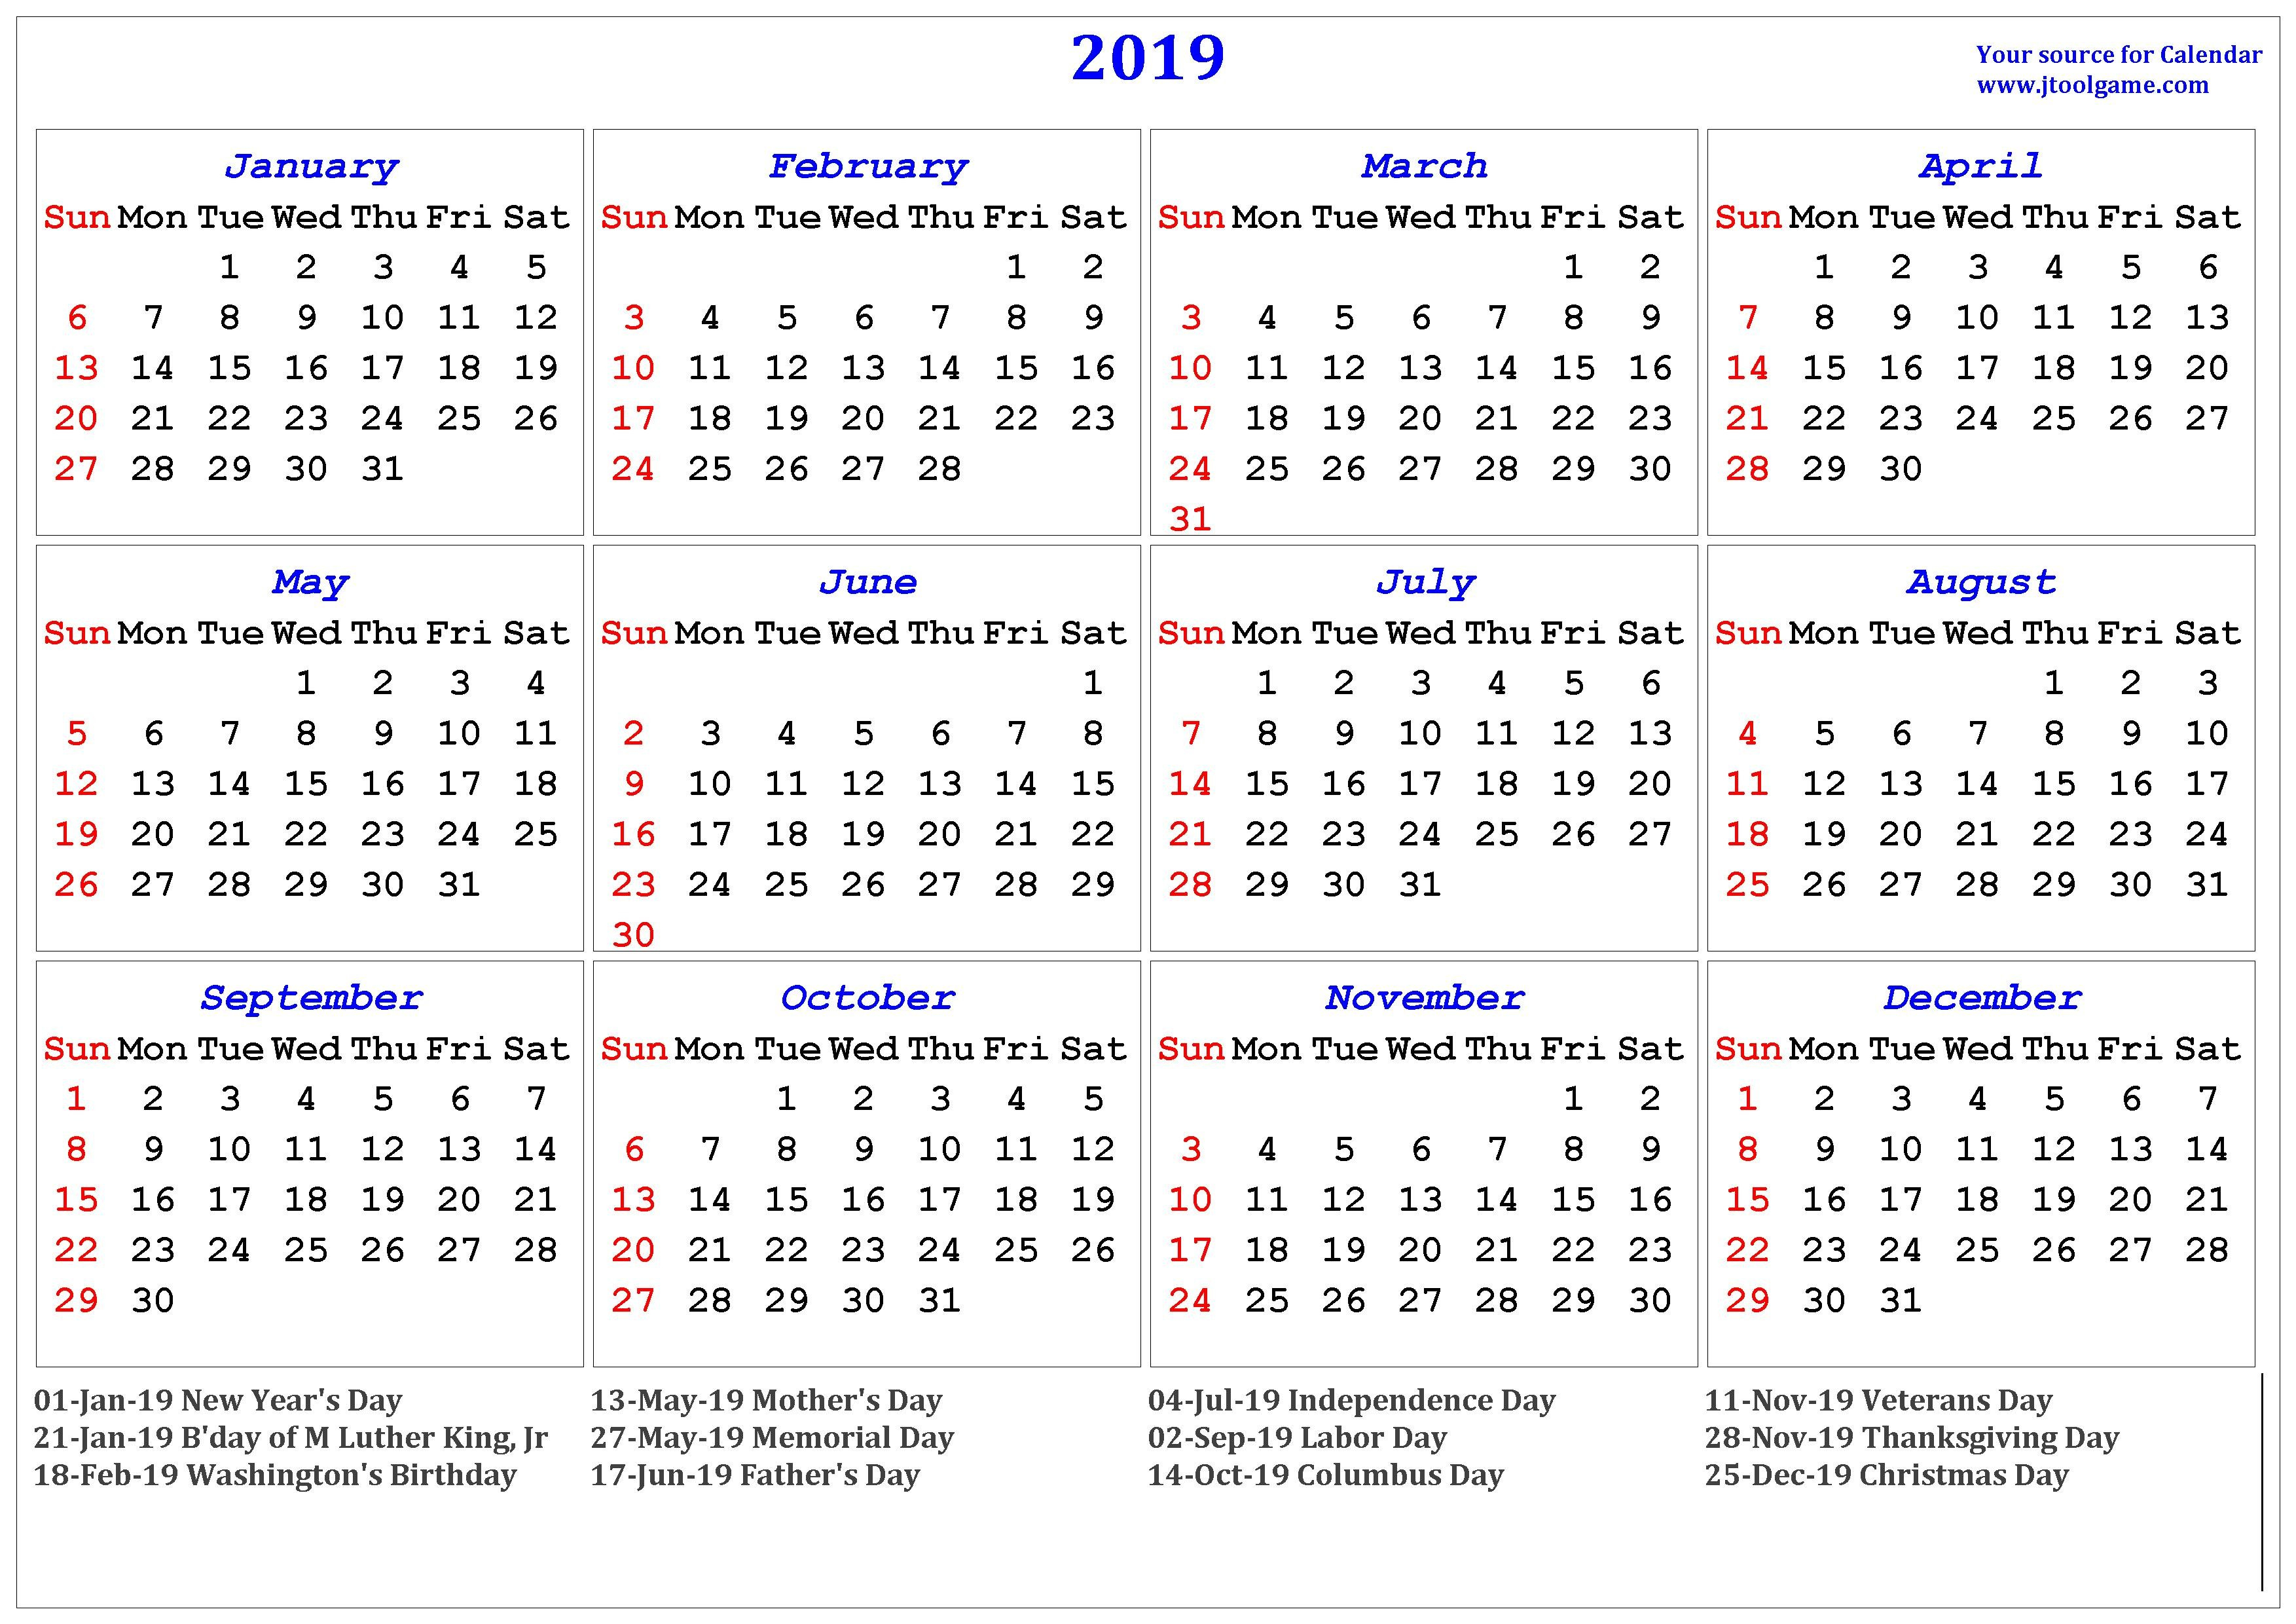 2019 Calendar - Printable Calendar. 2019 Calendar In Multiple Colors M Day Calendar 2019